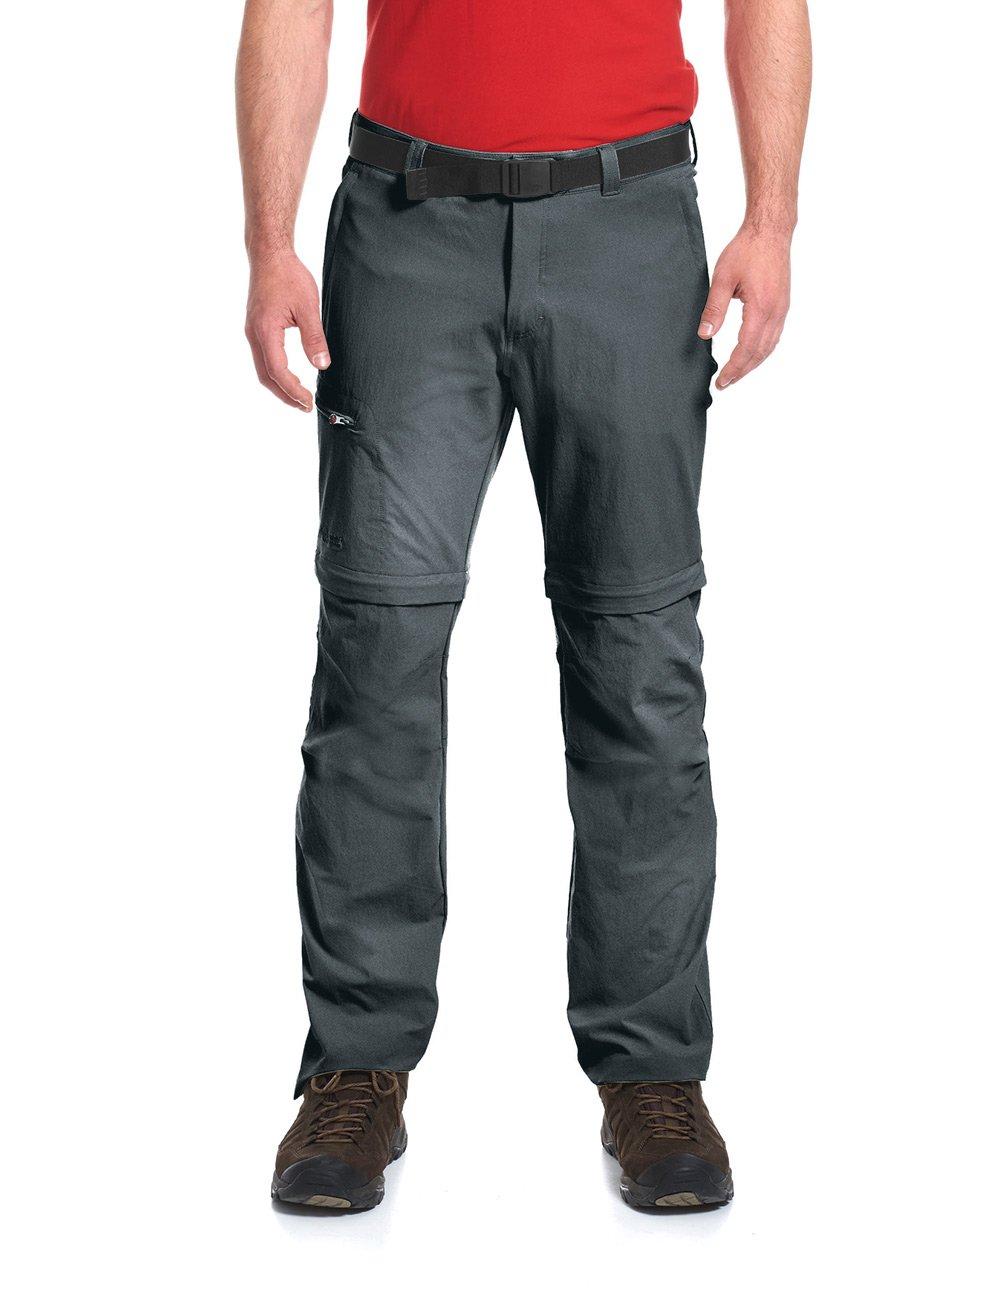 TALLA 52. Maier Sports Zipp, Pantalones de Senderismo para Hombre, Gris (Graphite), 52